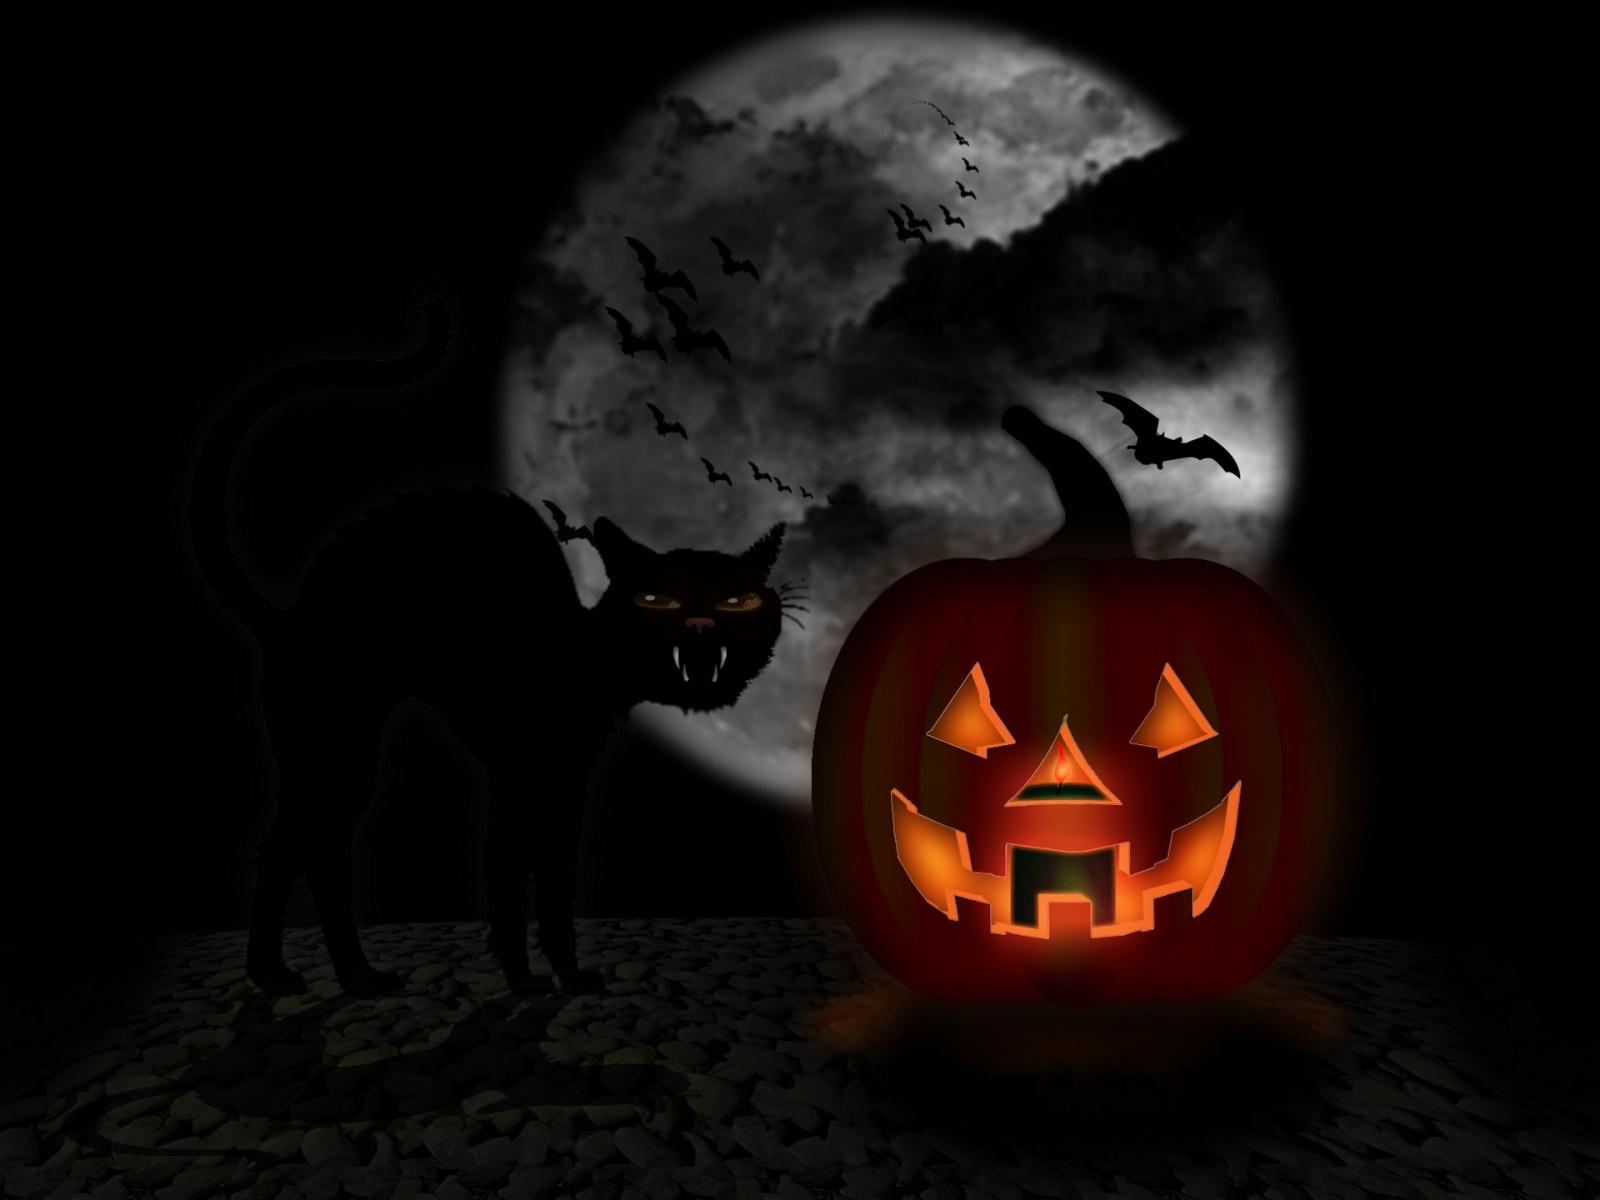 trololo blogg: Cute Halloween Wallpaper Desktop